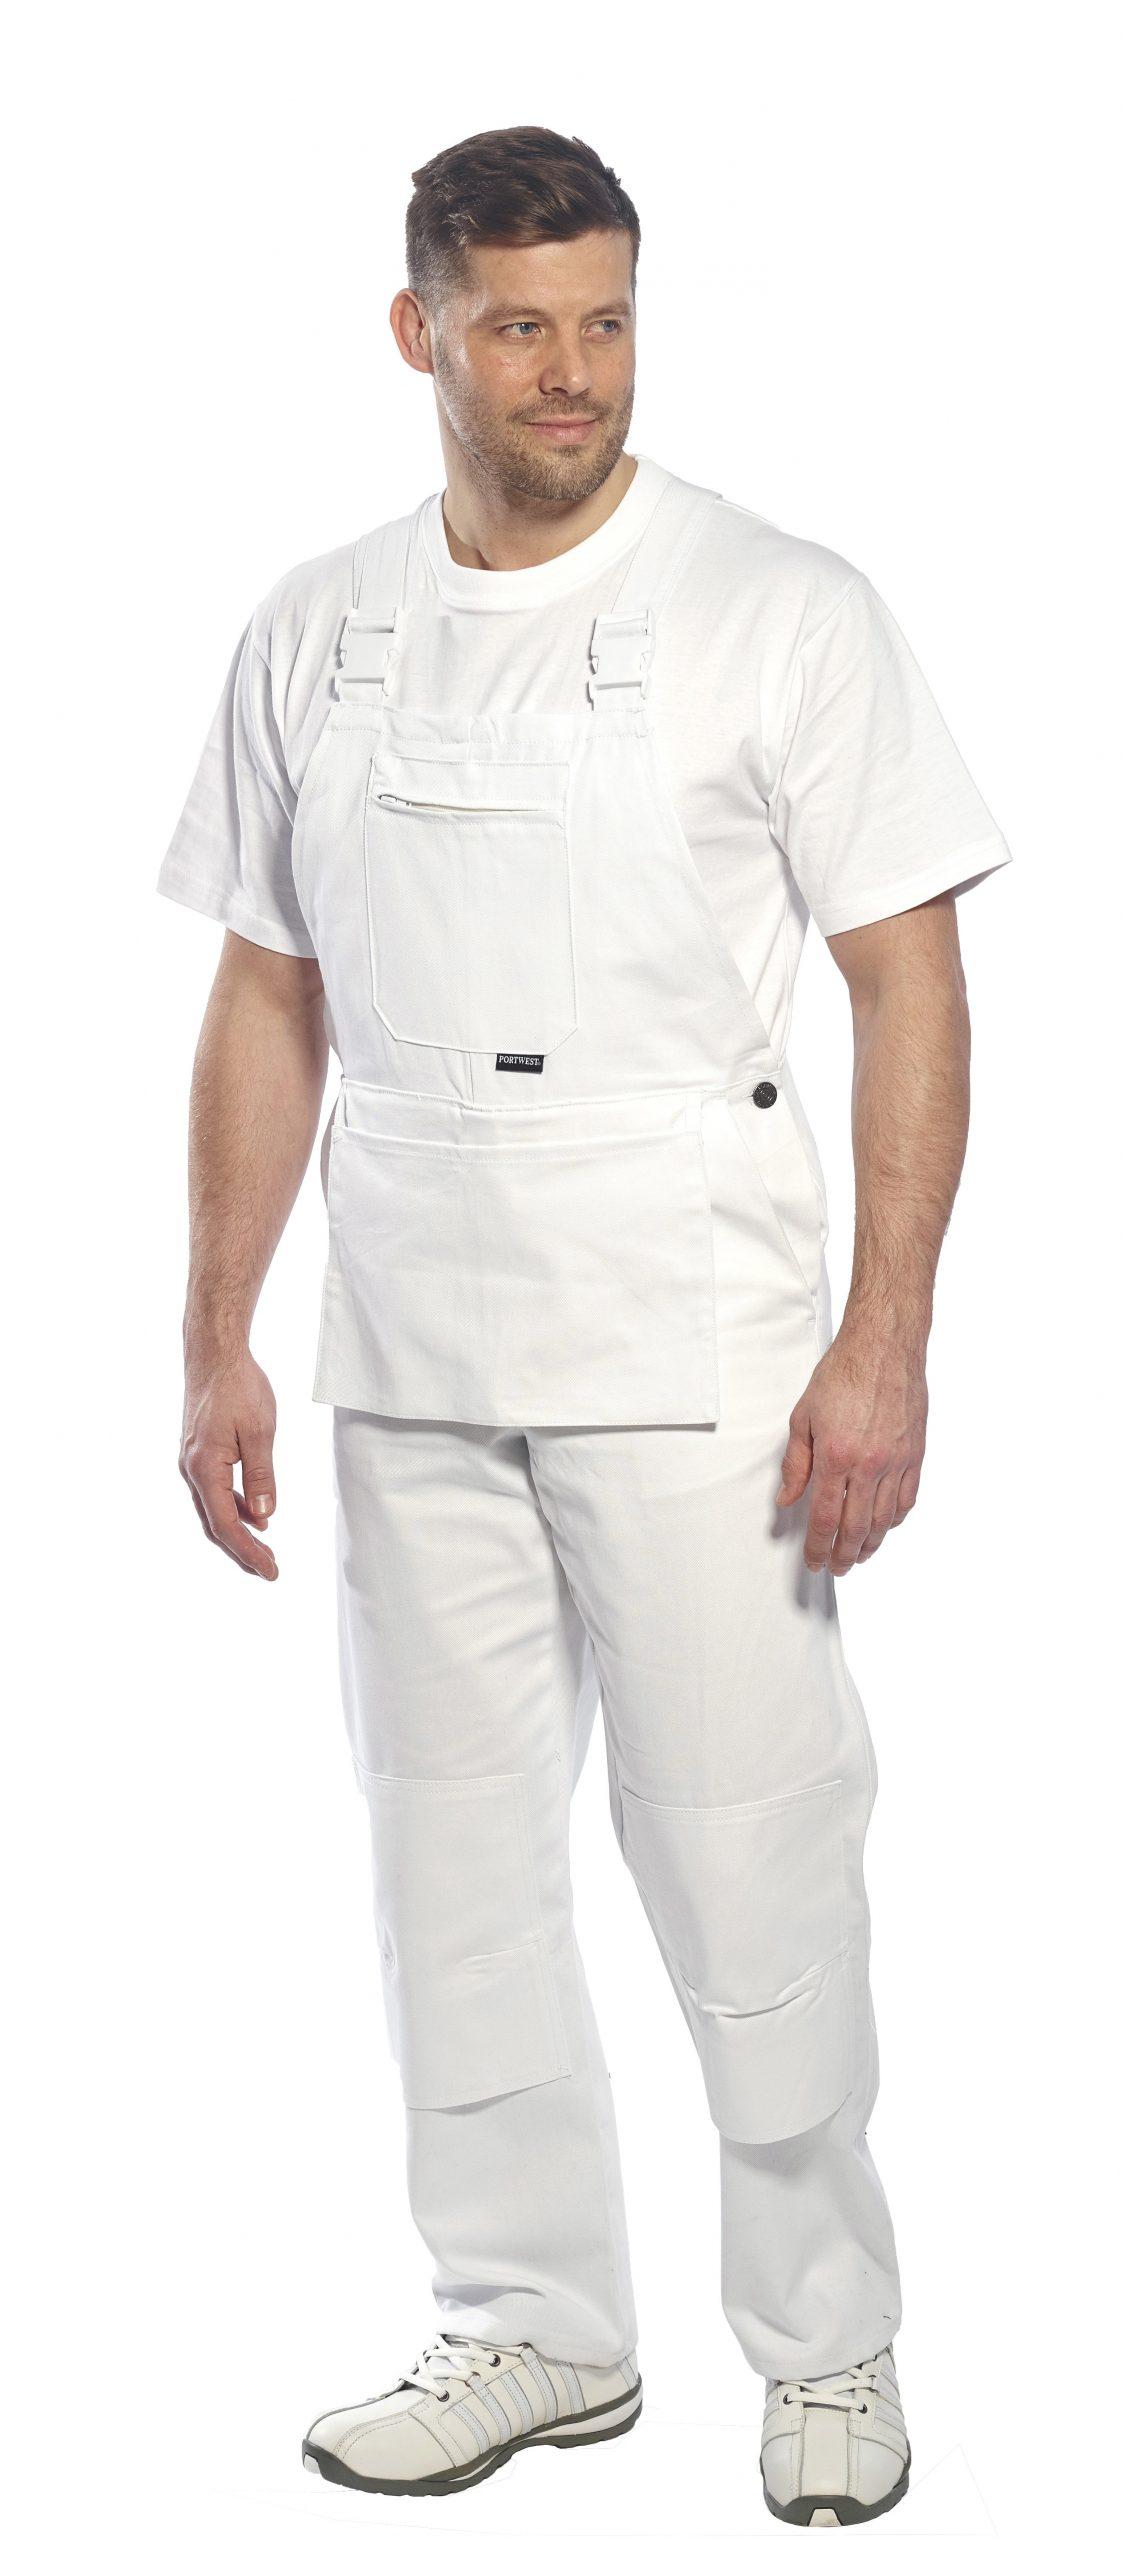 Portwest S810 Bolton Painters Bib Overall White Regular Sizes XS-4XL